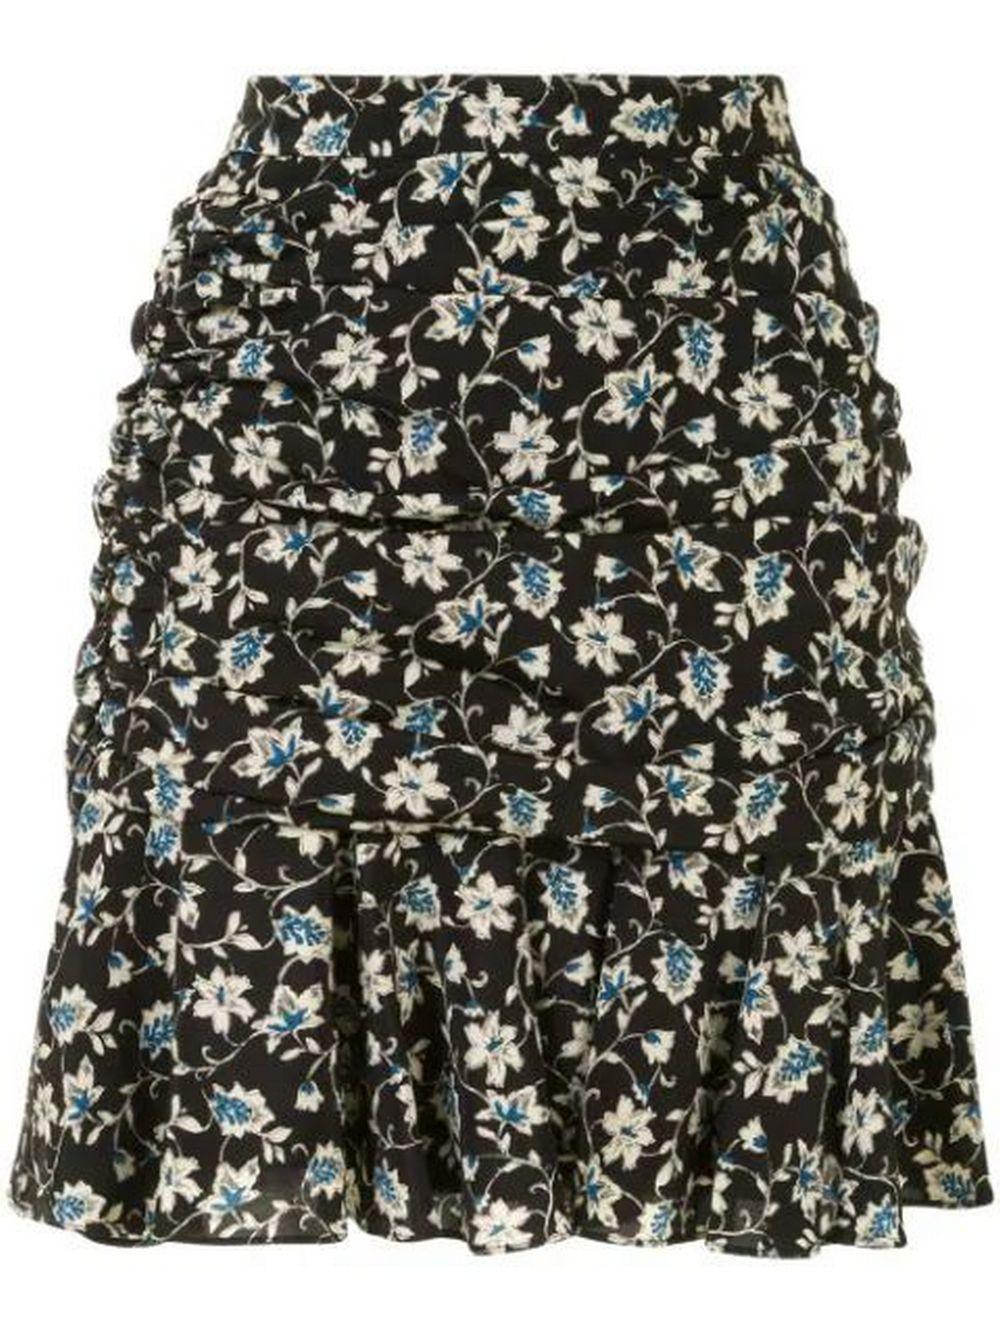 Taras Skirt Item # 2006SDC013293